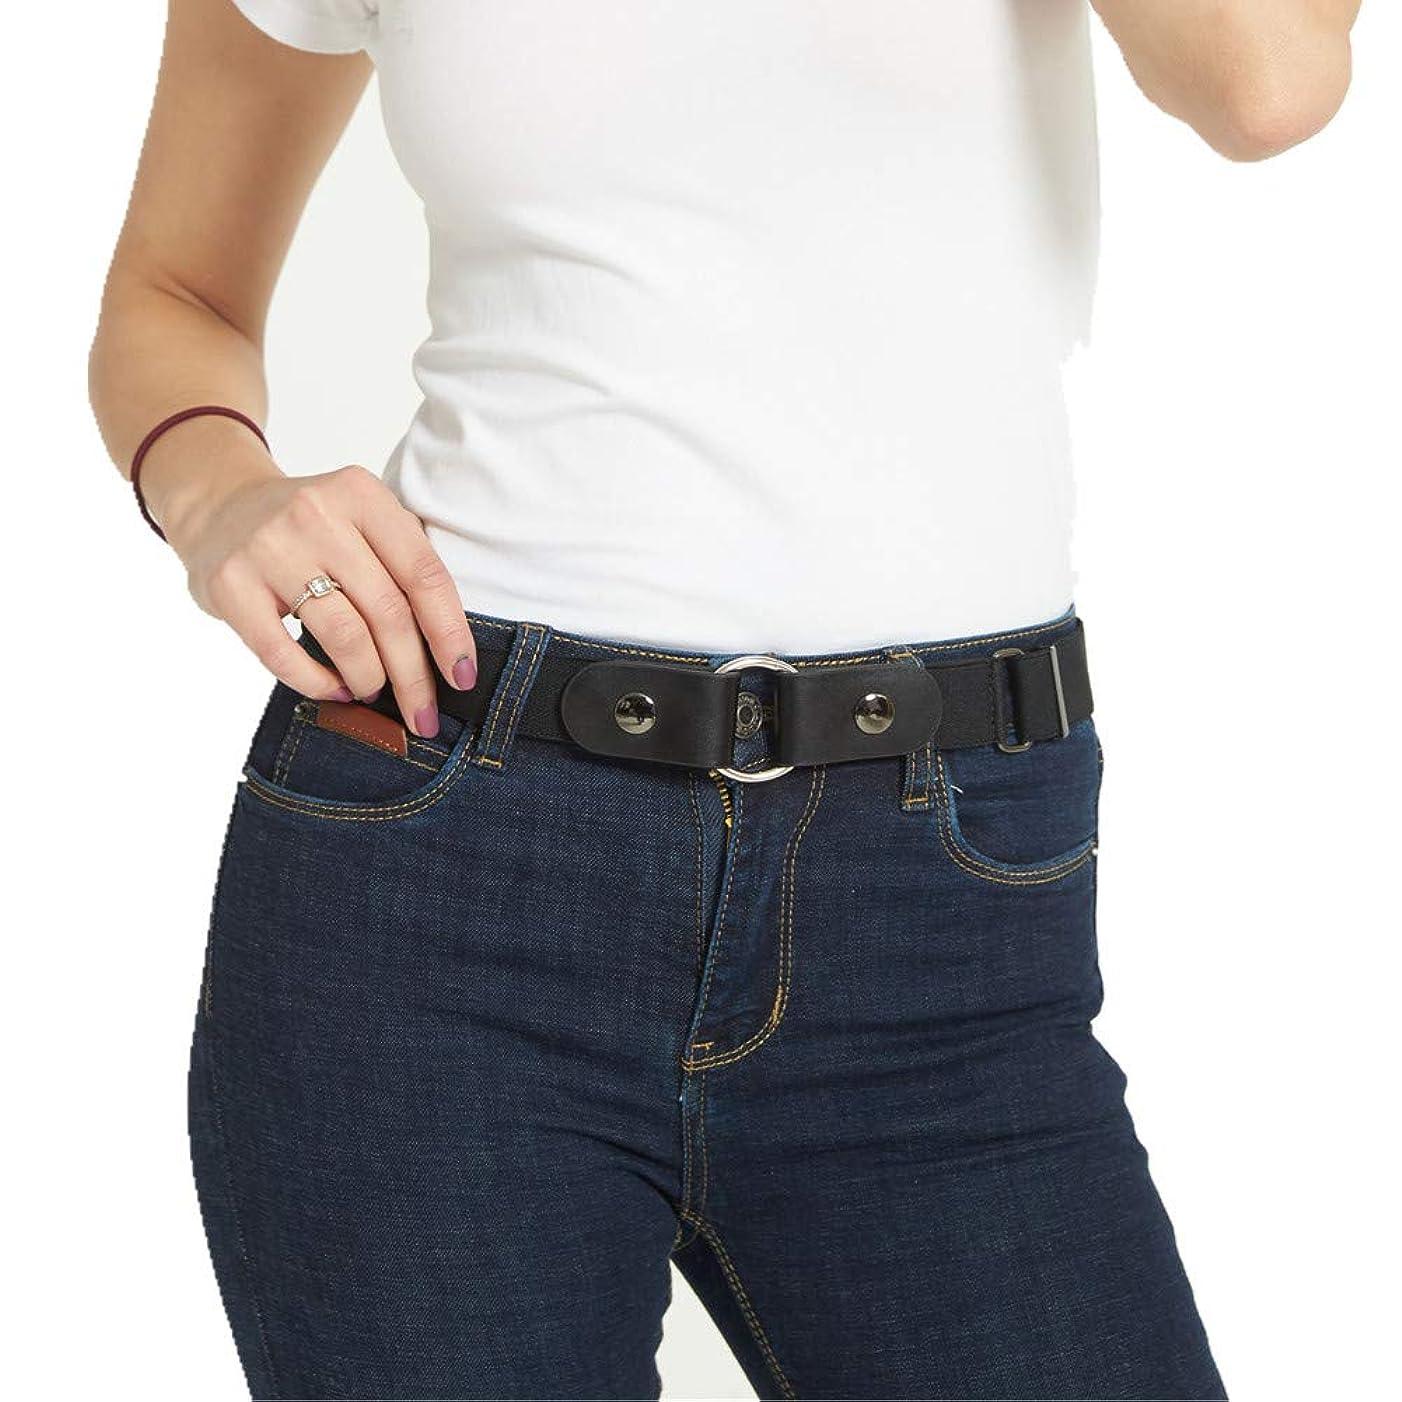 Buckle Free Belt for Women and Men, No Hassle, No Bulge Comfortable Elastic Belt